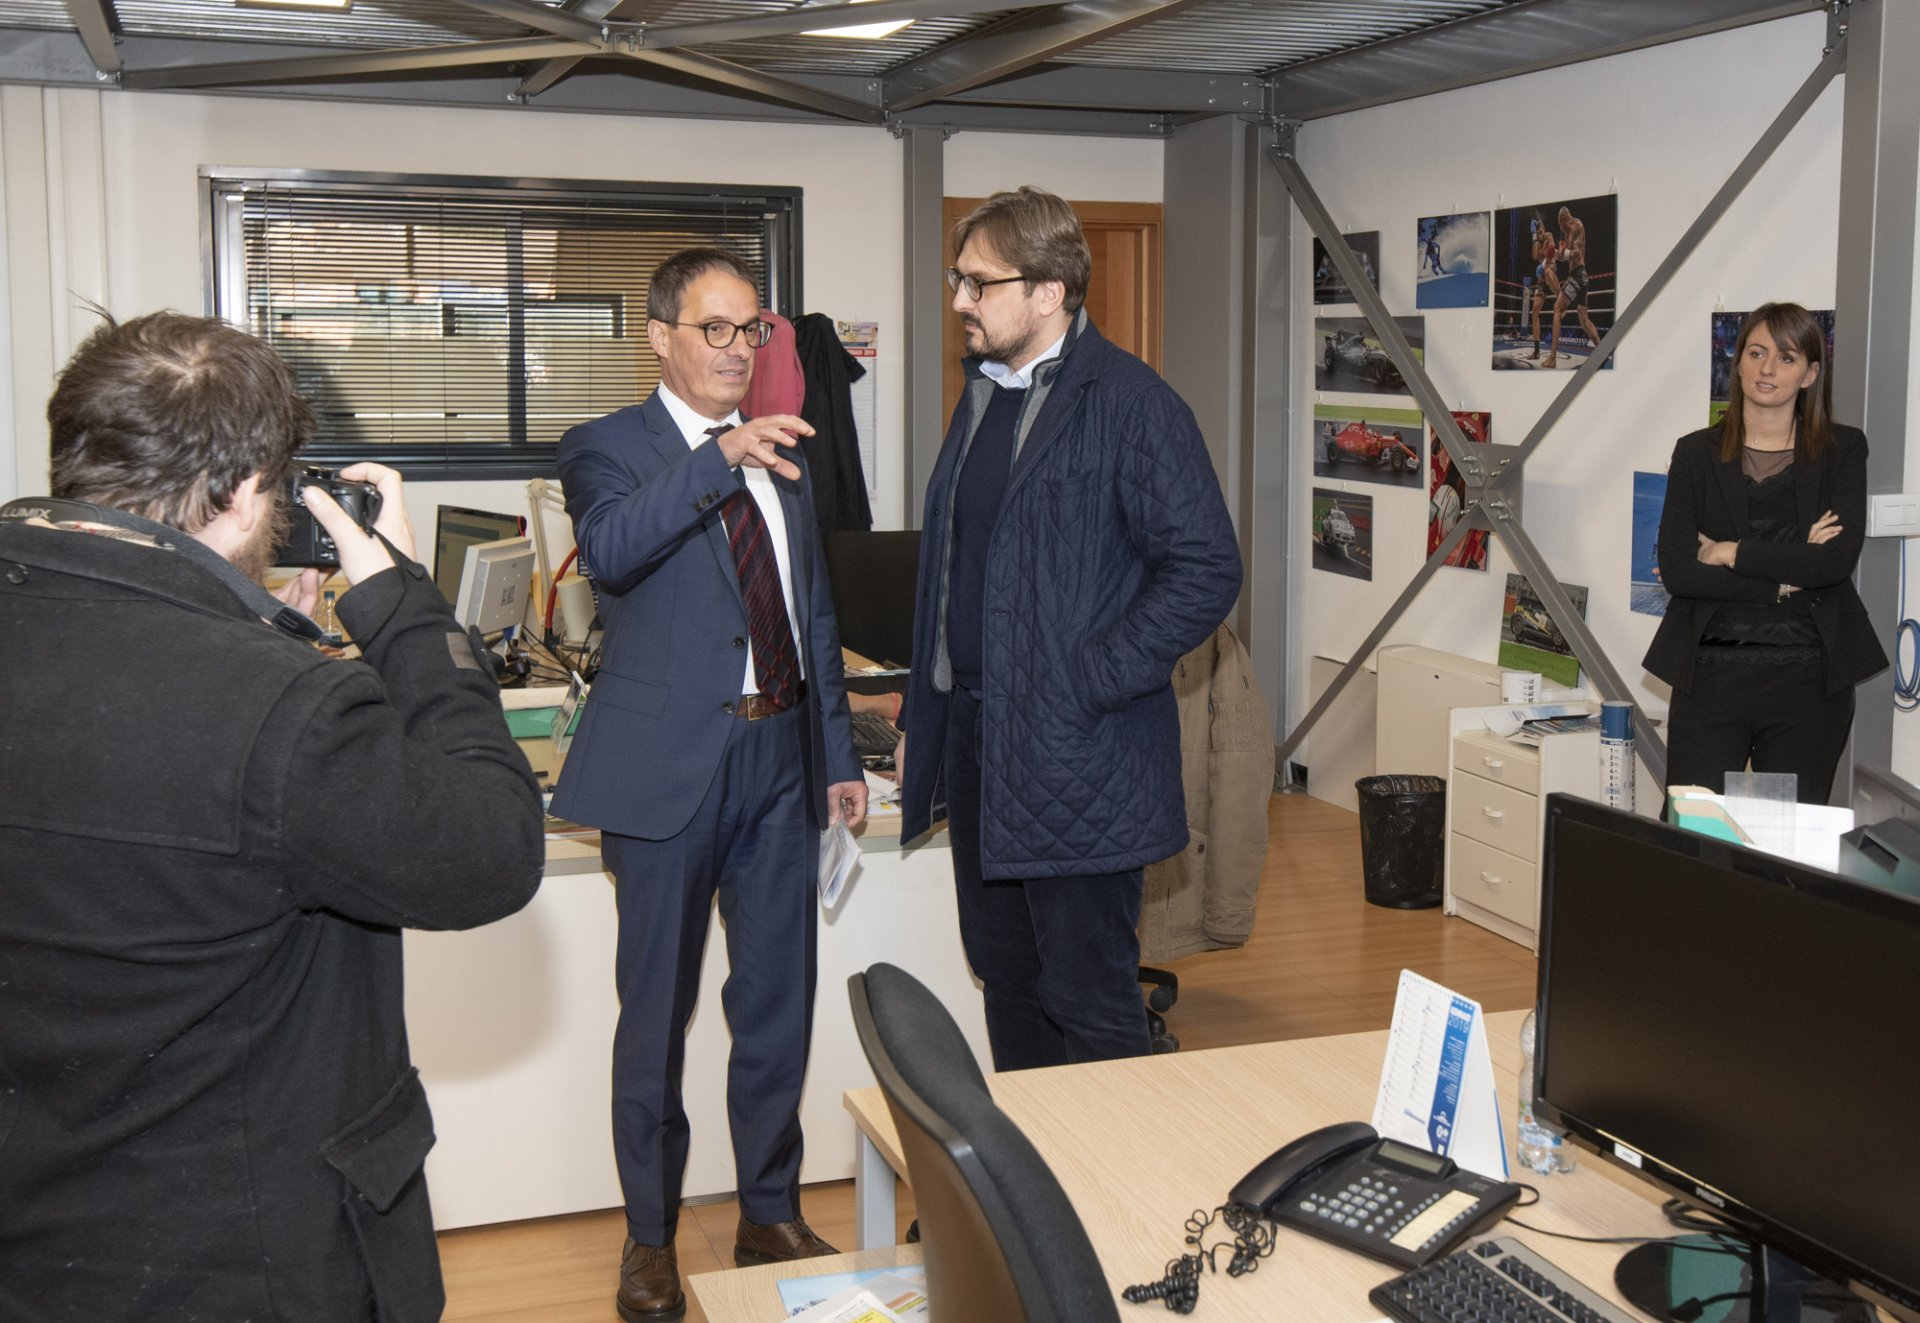 L'onorevole Guidesi (Lega) visita la sede Netweek VIDEO